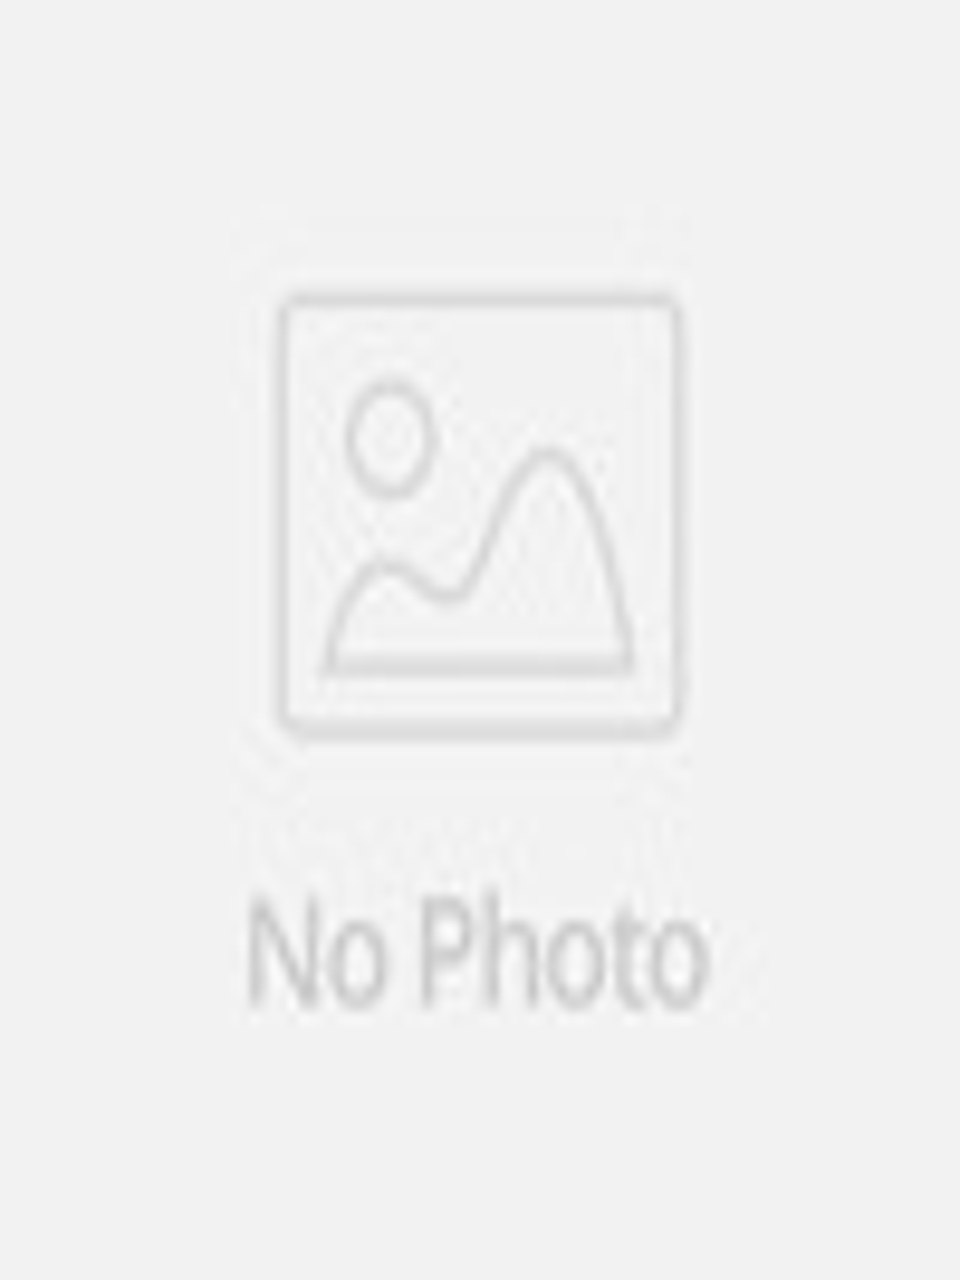 Костюм панды своими руками на взрослого